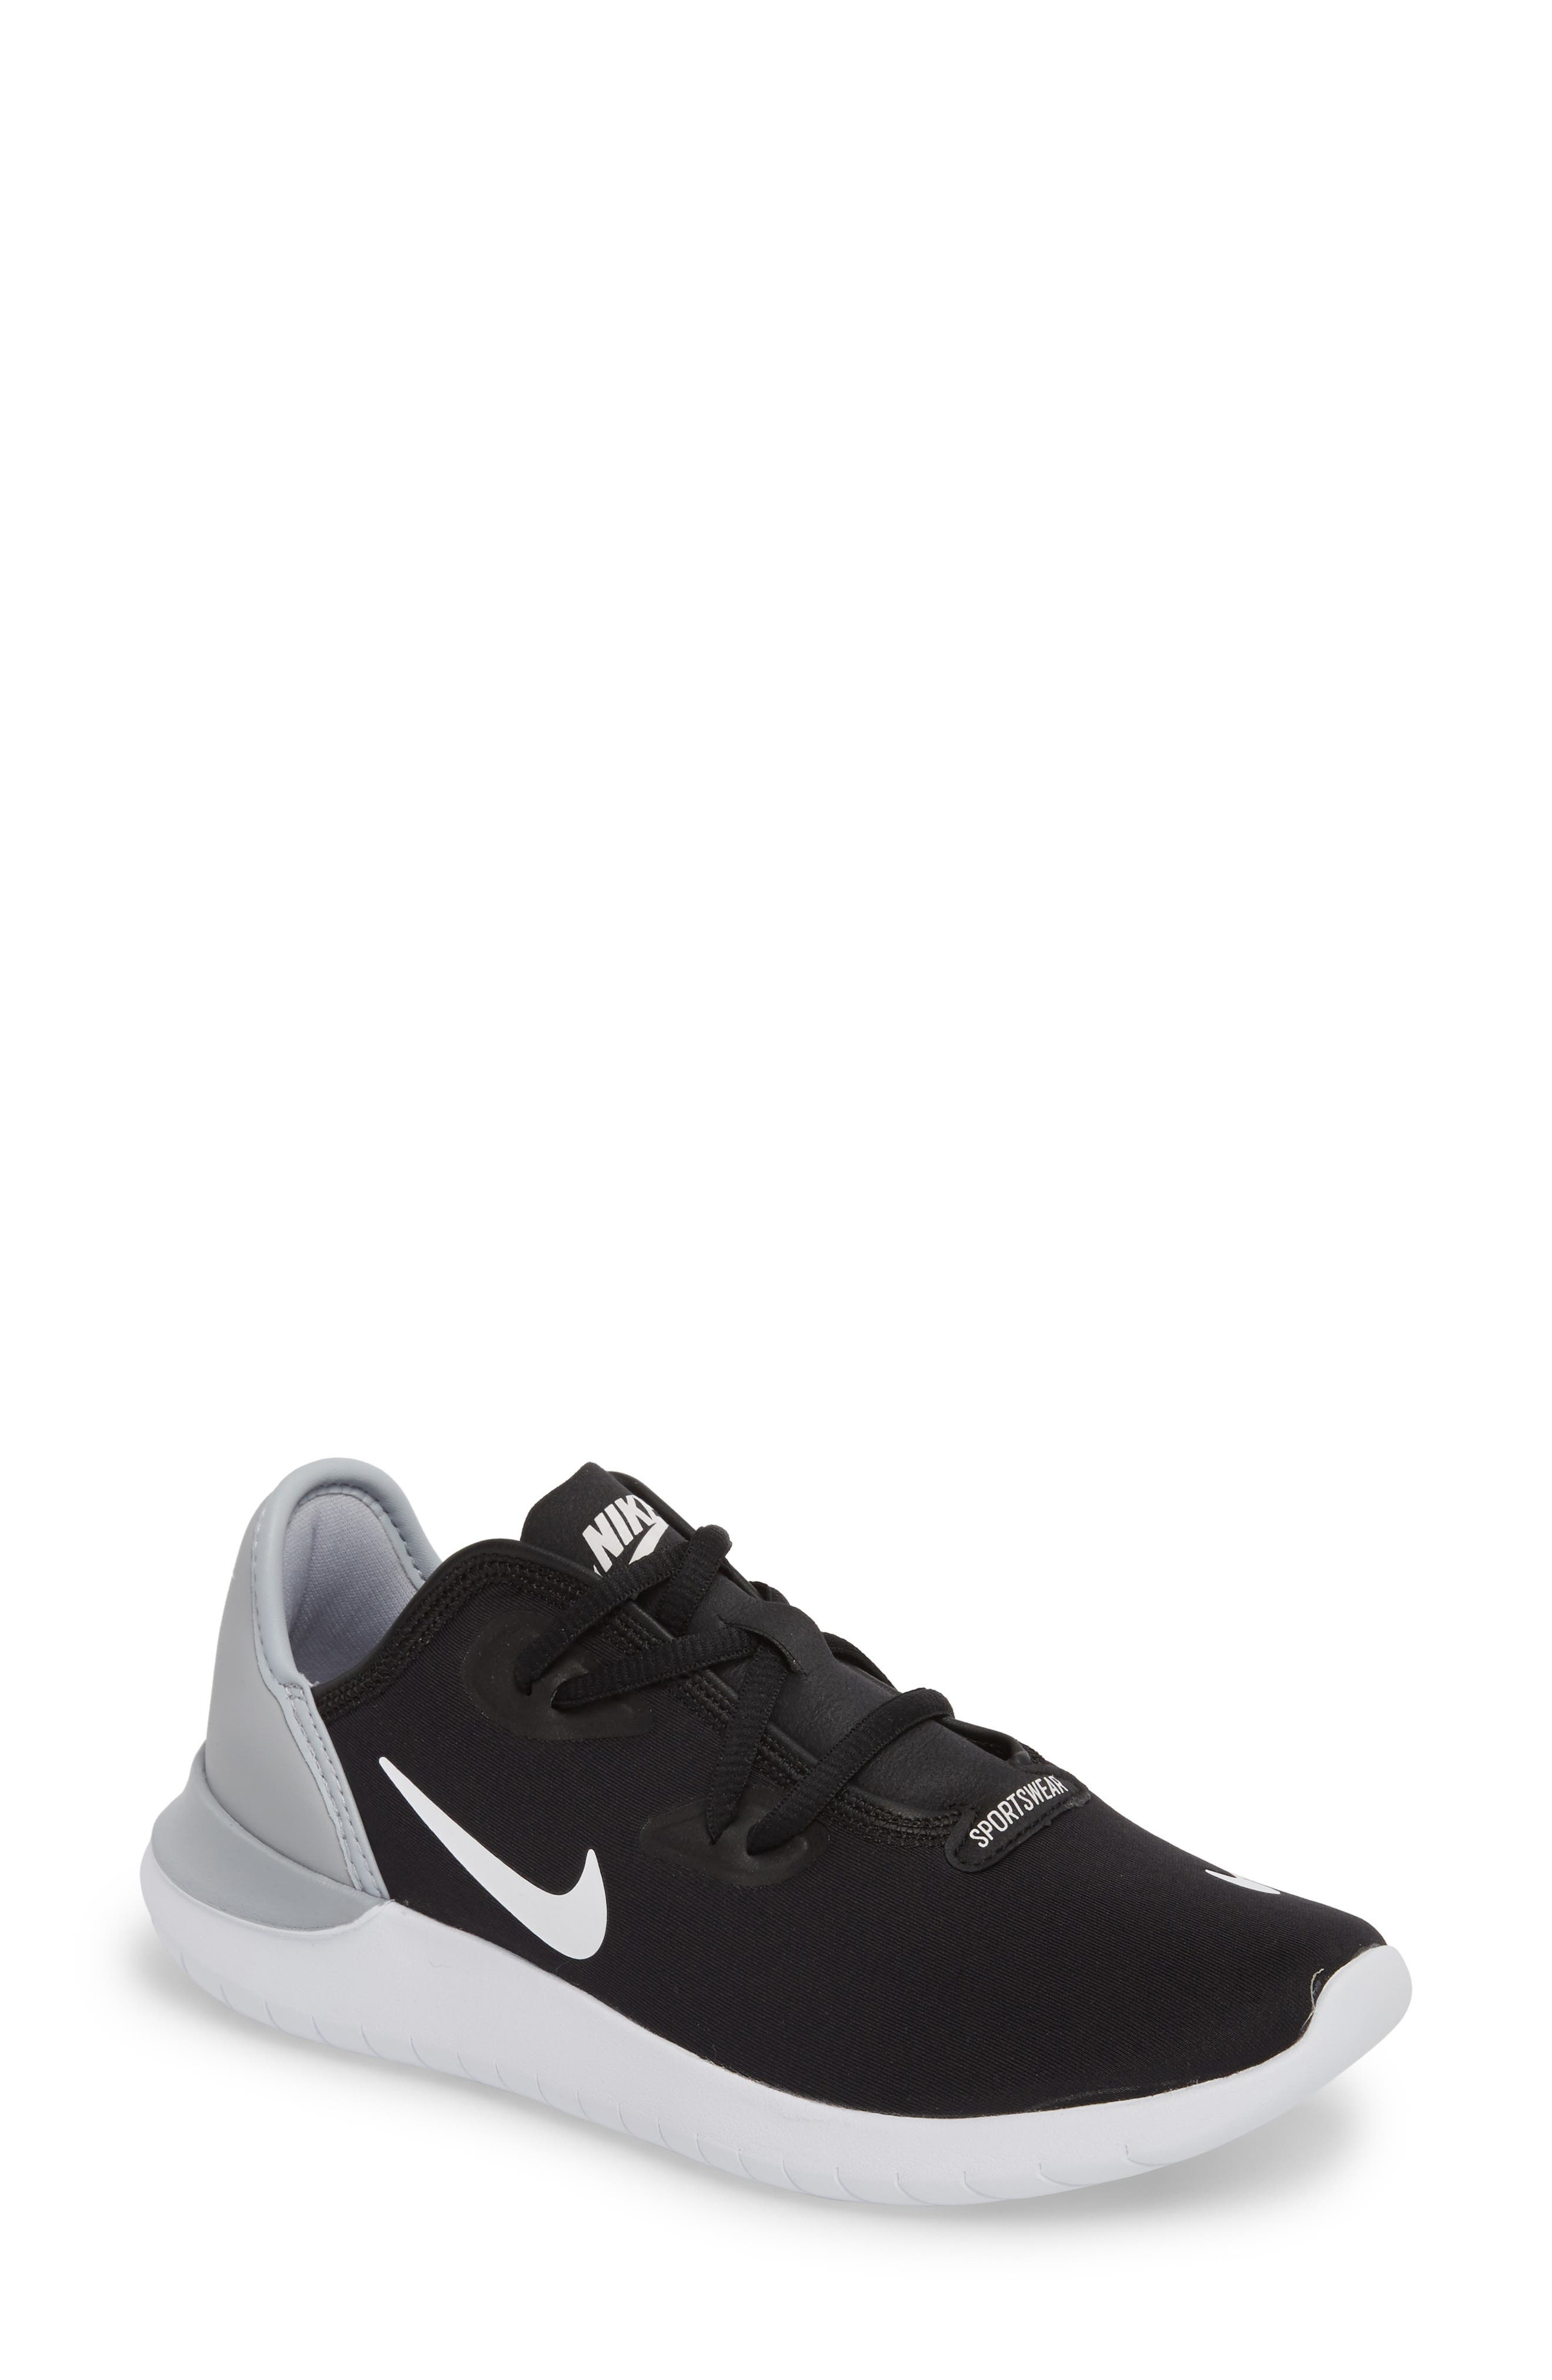 Hakata Sneaker,                         Main,                         color, BLACK/ WHITE